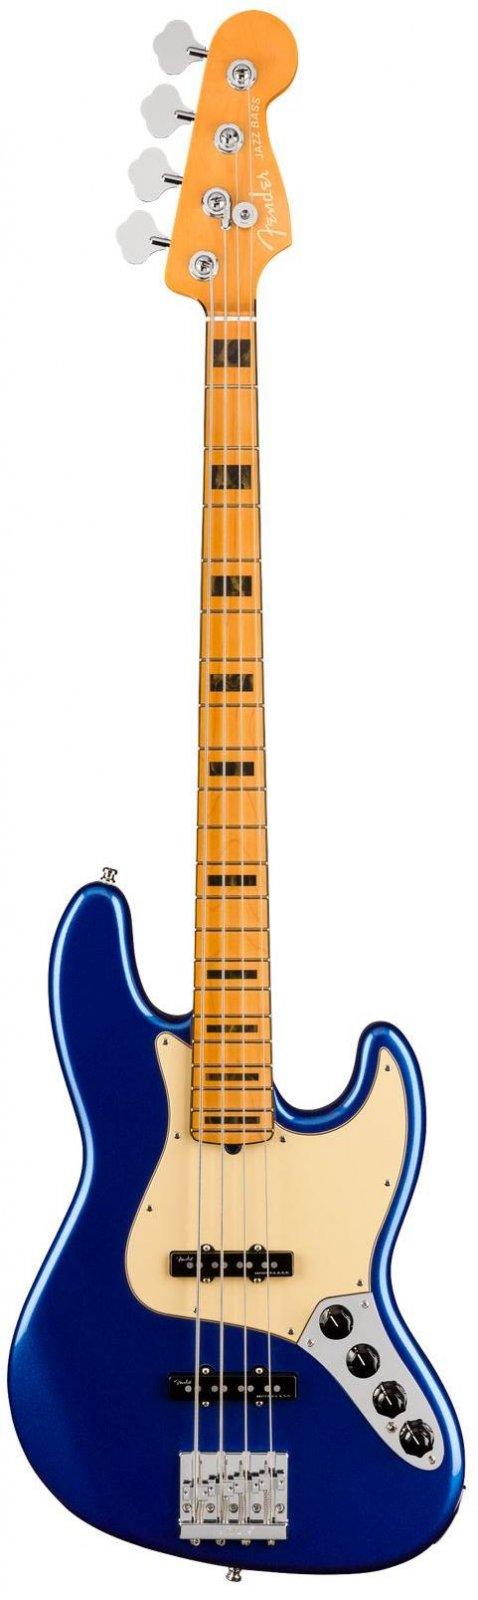 Fender 0199022795 American Ultra Jazz Bass with Maple Fretboard - Cobra Blue